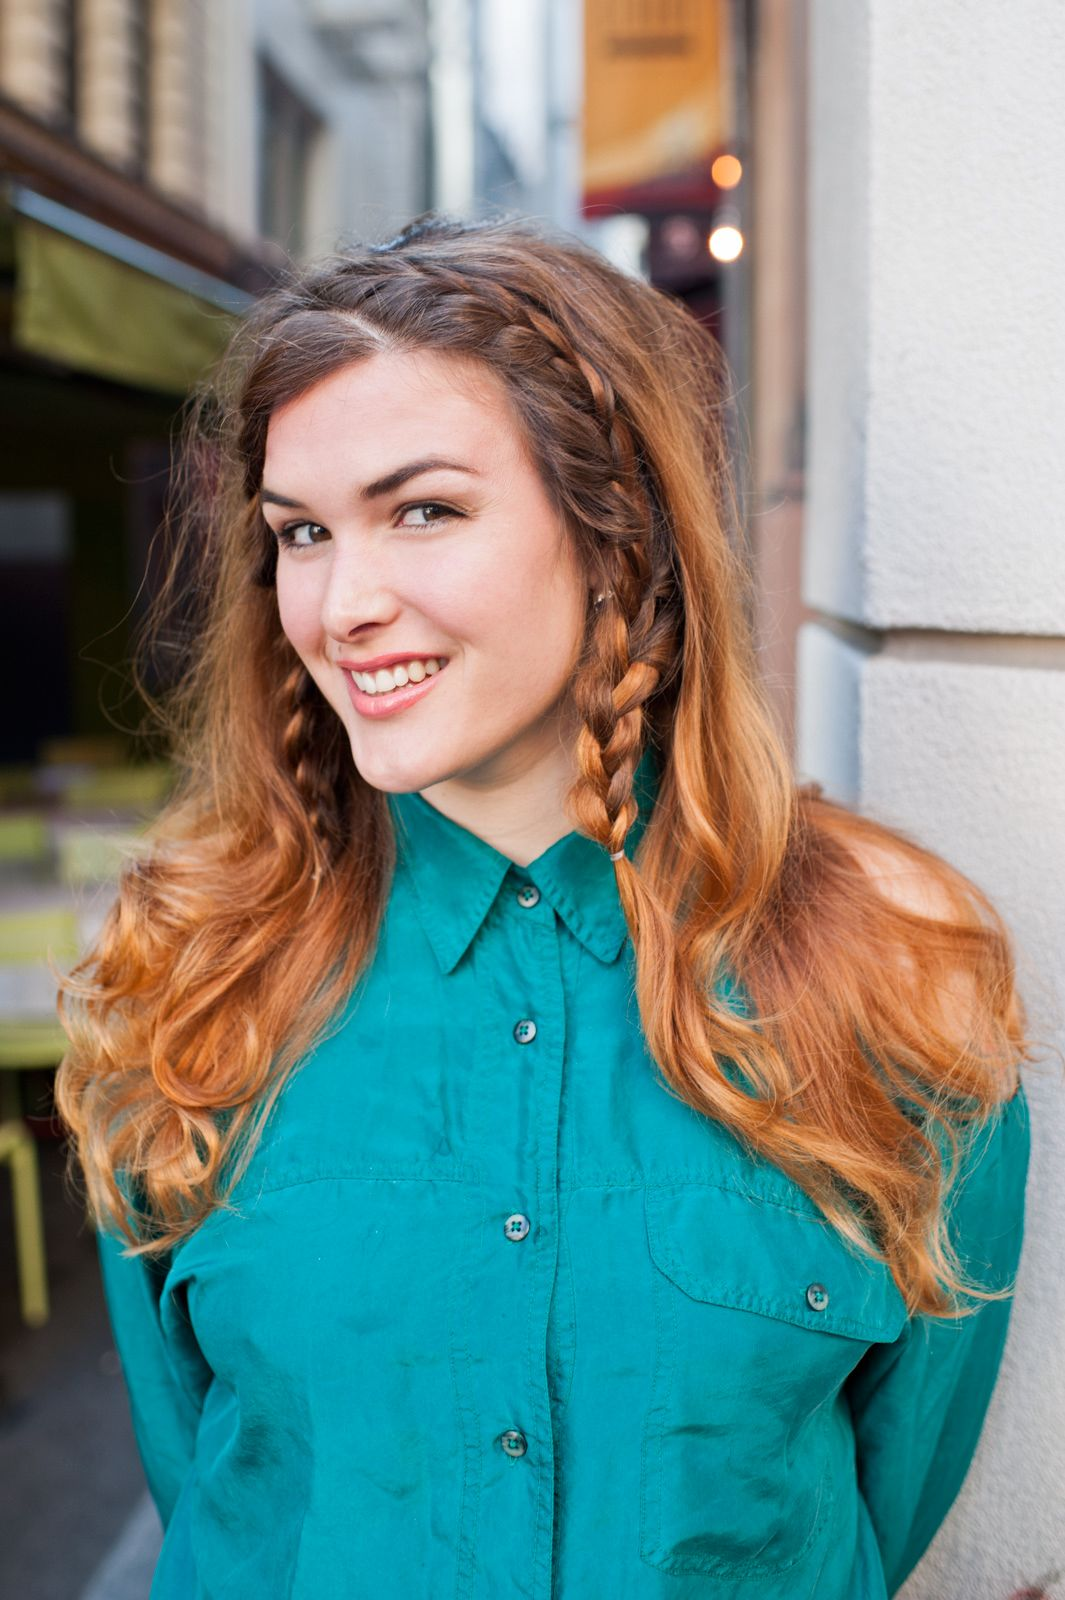 S hairstyles how to do retro hair retro hair and fine hair